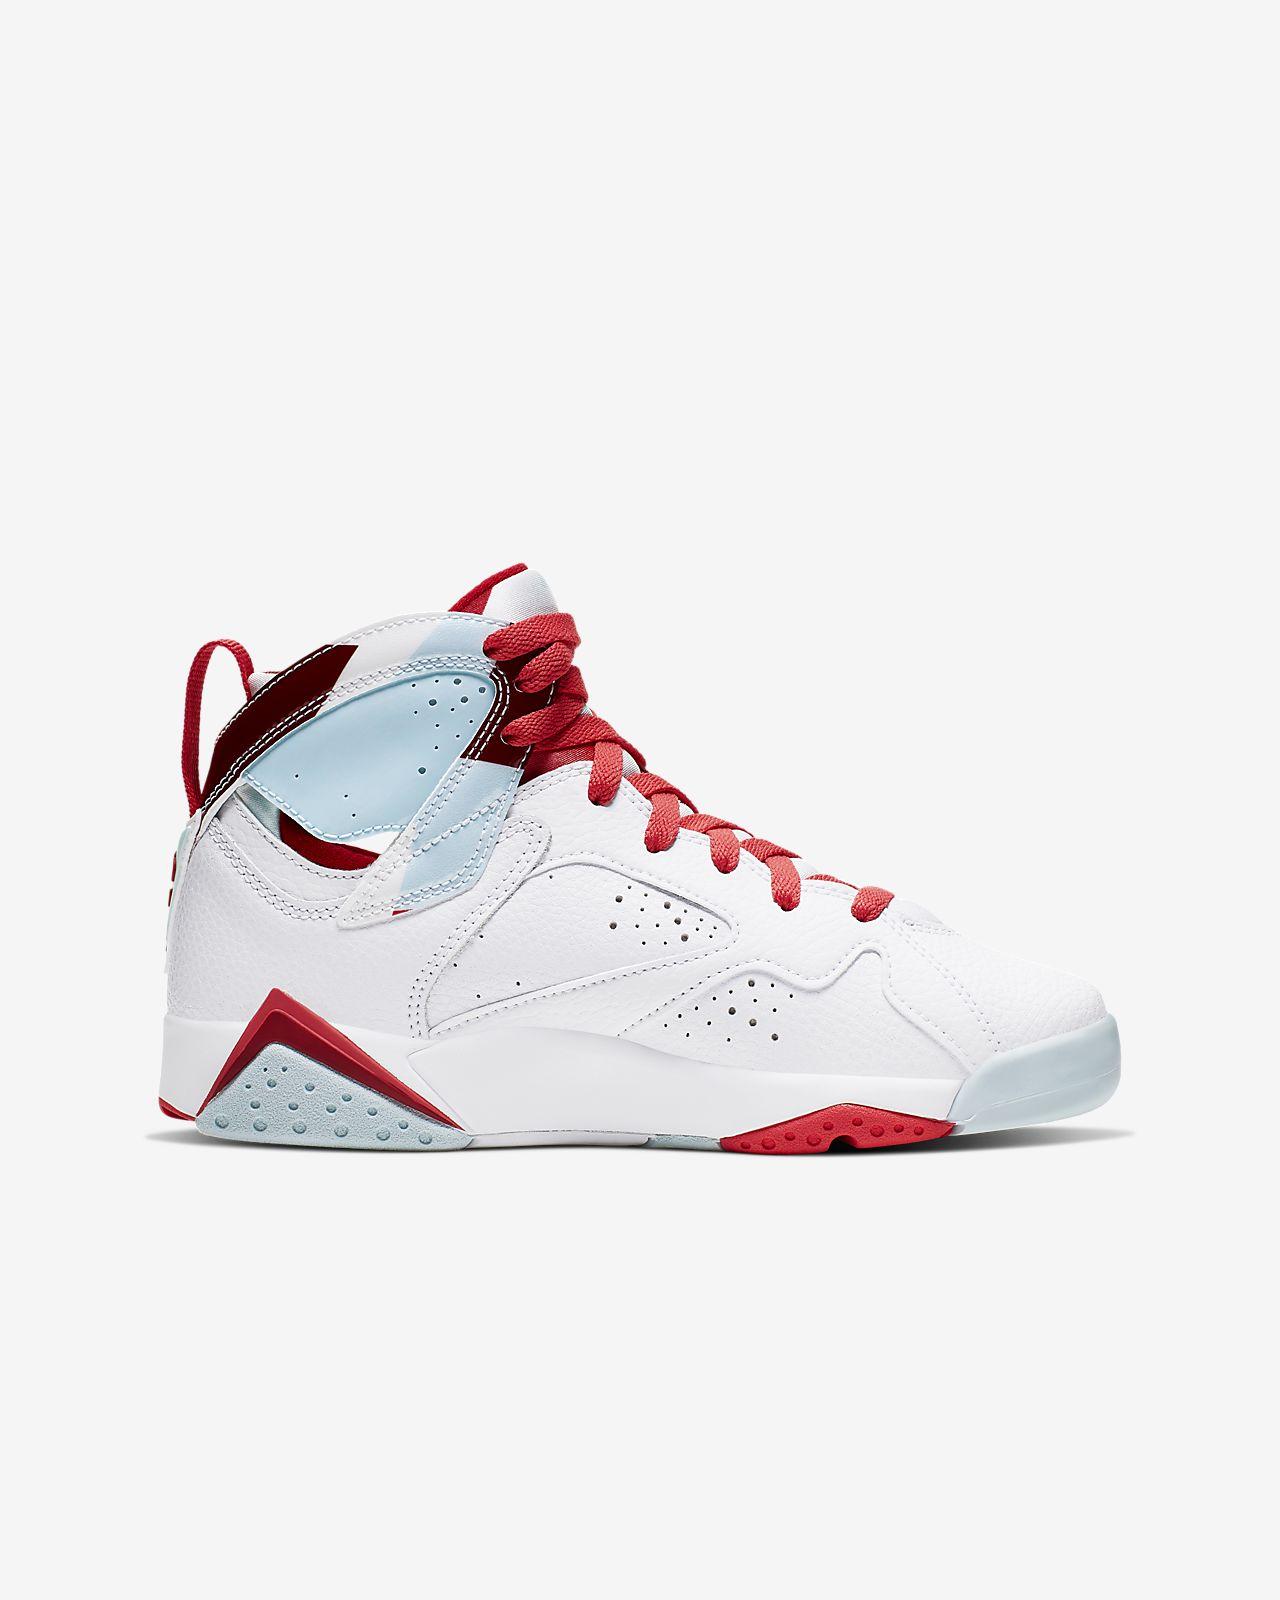 67c962e423652e Air Jordan 7 Retro (3.5y-9.5y) Big Kids  Shoe. Nike.com